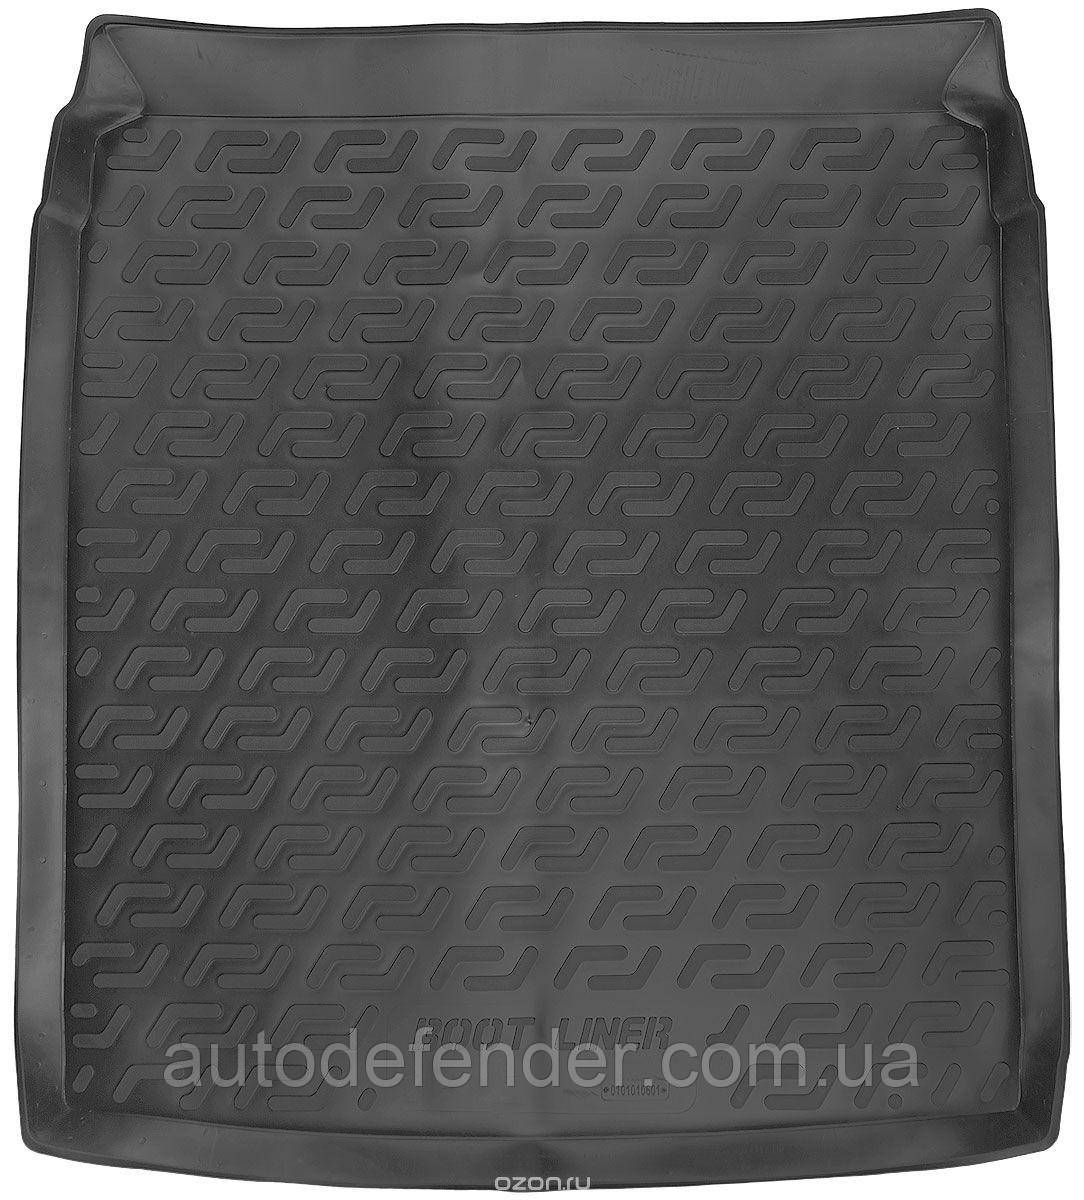 Килимок в багажник для Volkswagen Passat B7 2010-14 седан, резино/пластиковий (Lada Locker)